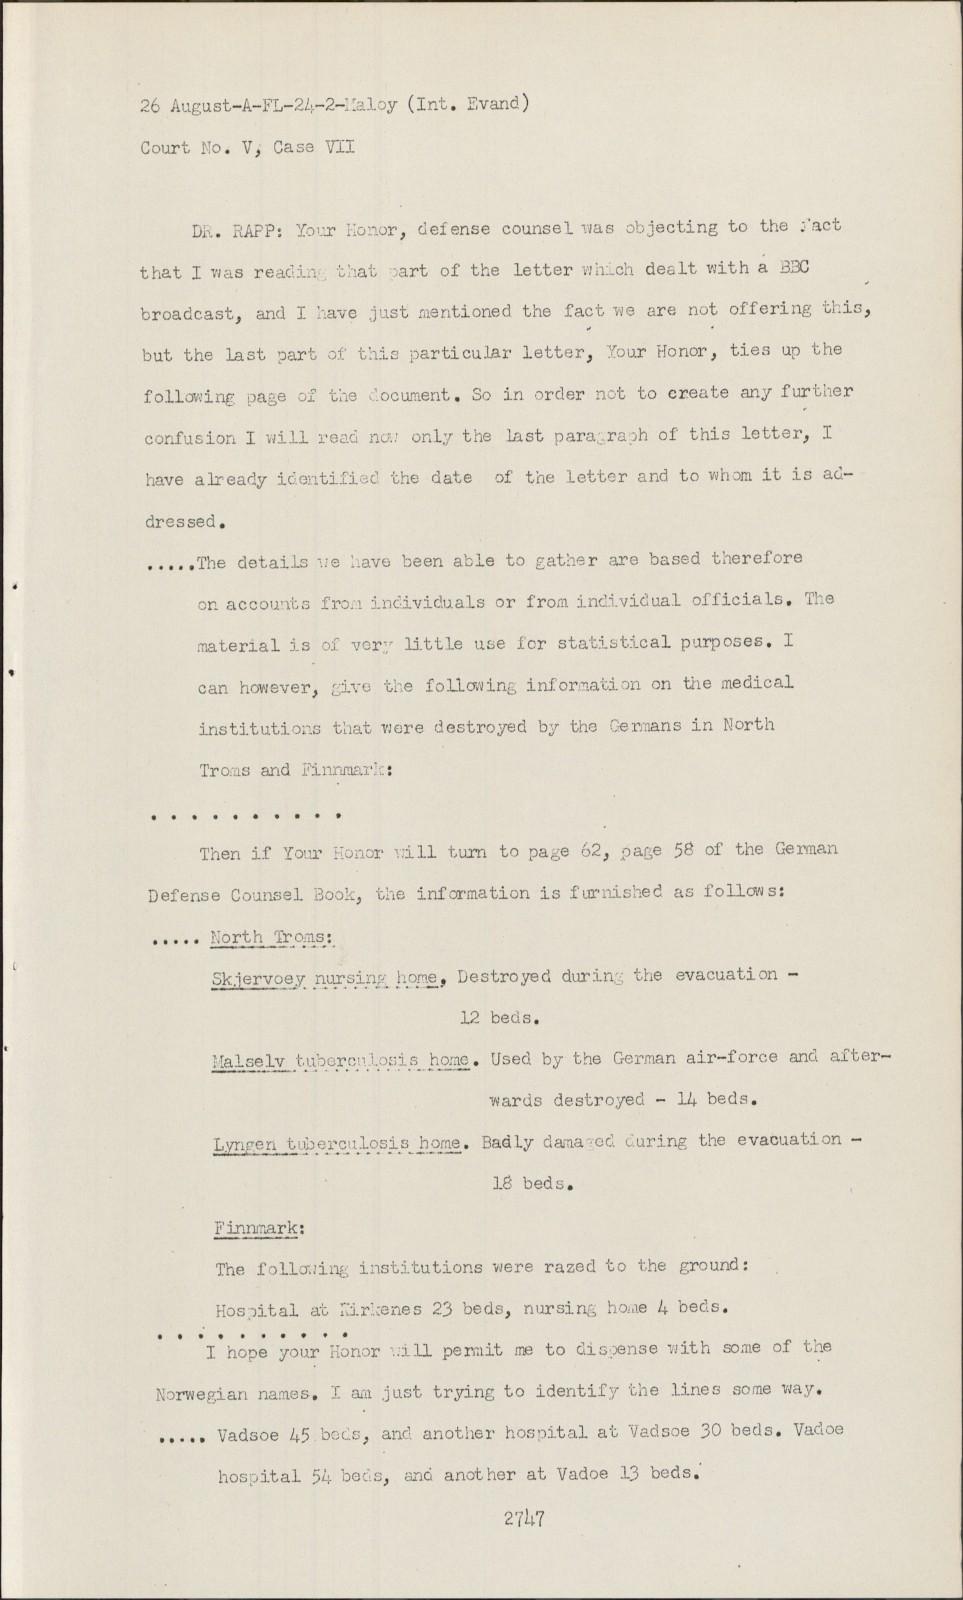 Nuremberg transcript viewer transcript for nmt 7: hostage case.